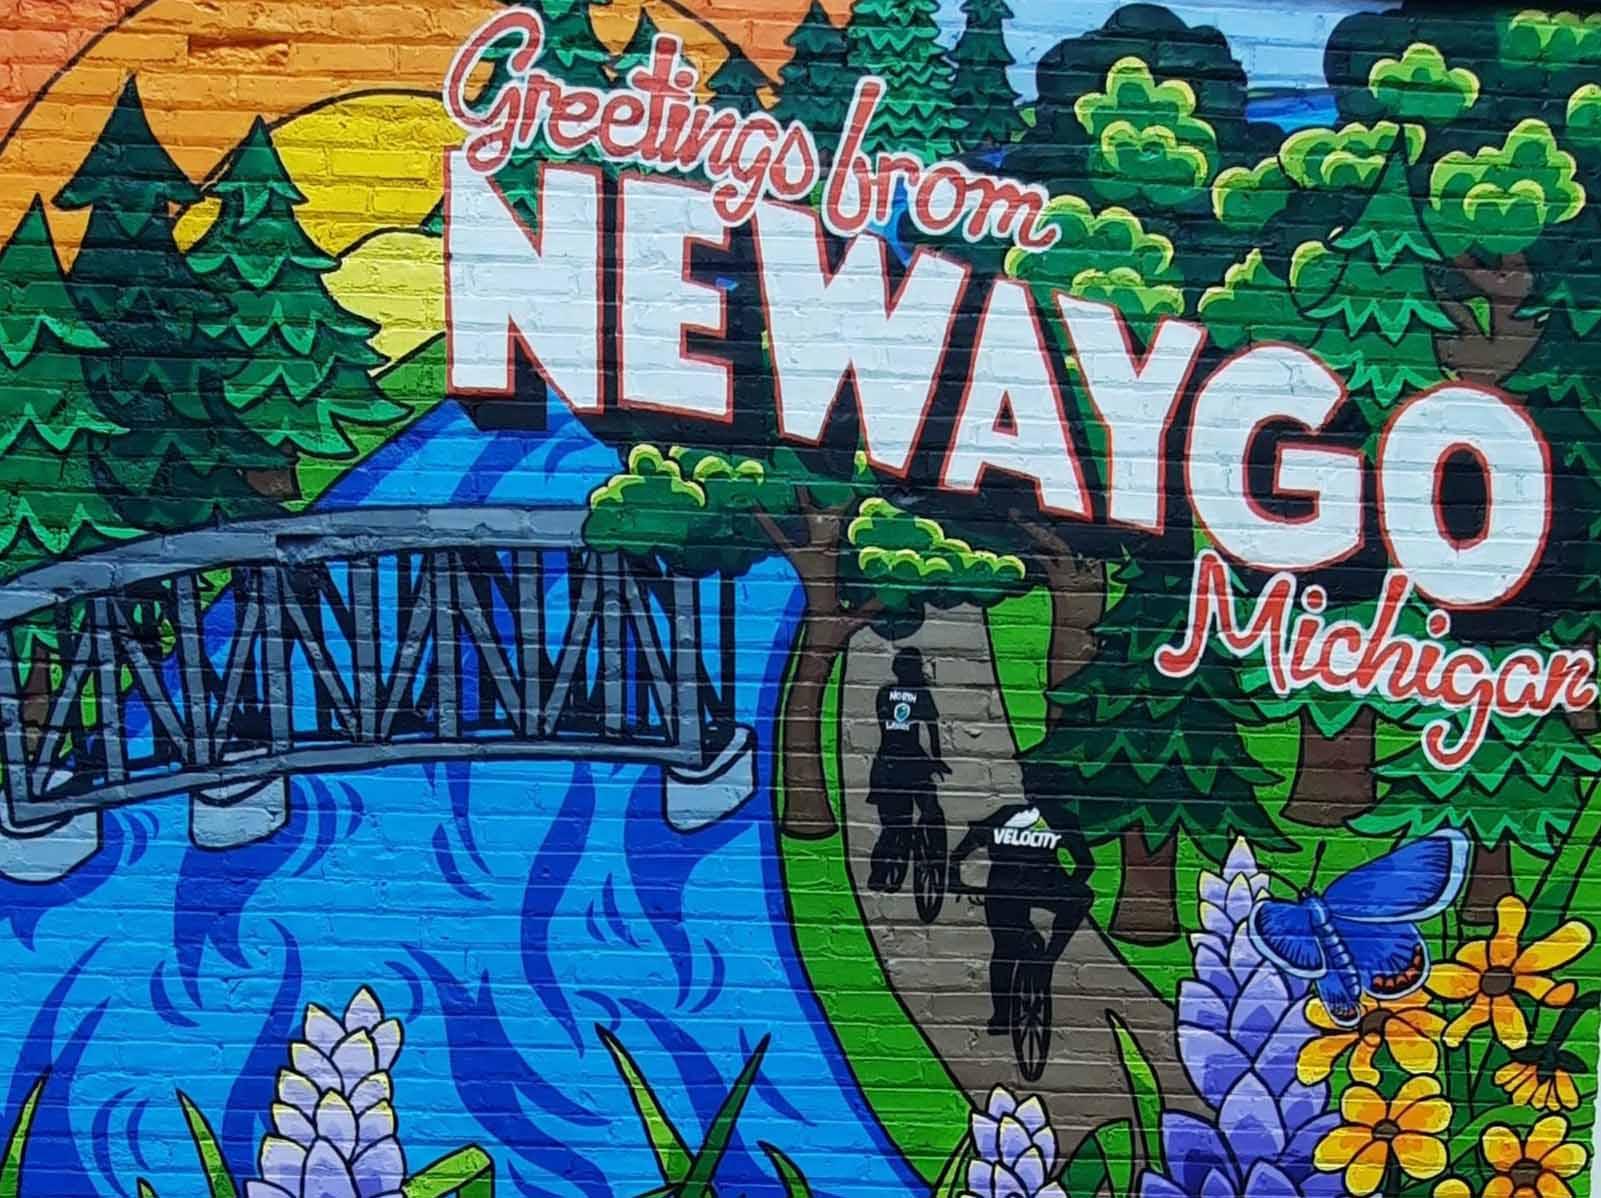 Greetings from Newaygo mural